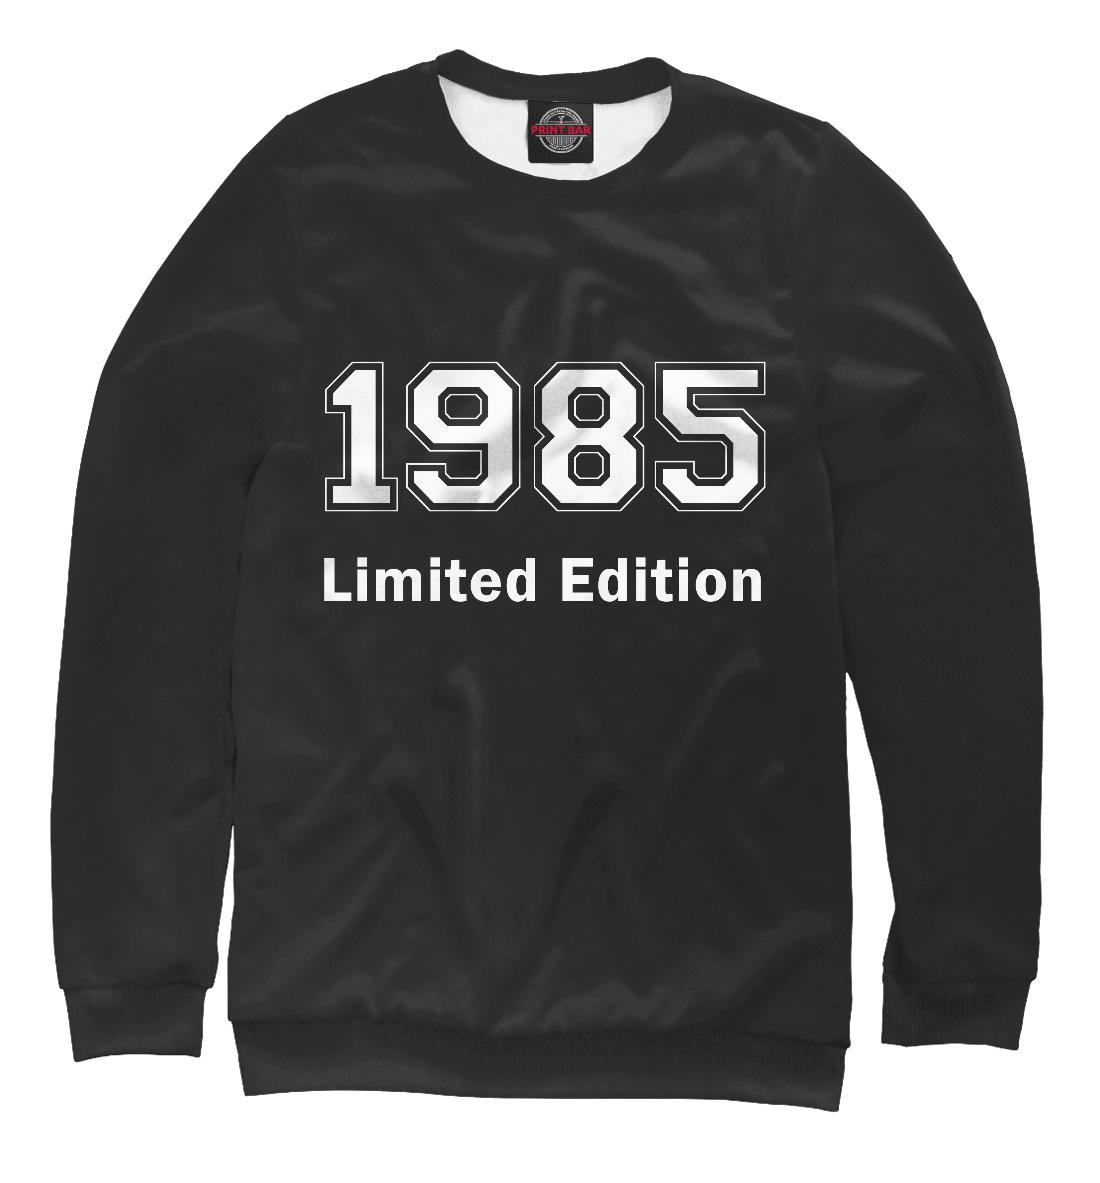 Купить 1985 Limited Edition, Printbar, Свитшоты, DVP-458398-swi-2